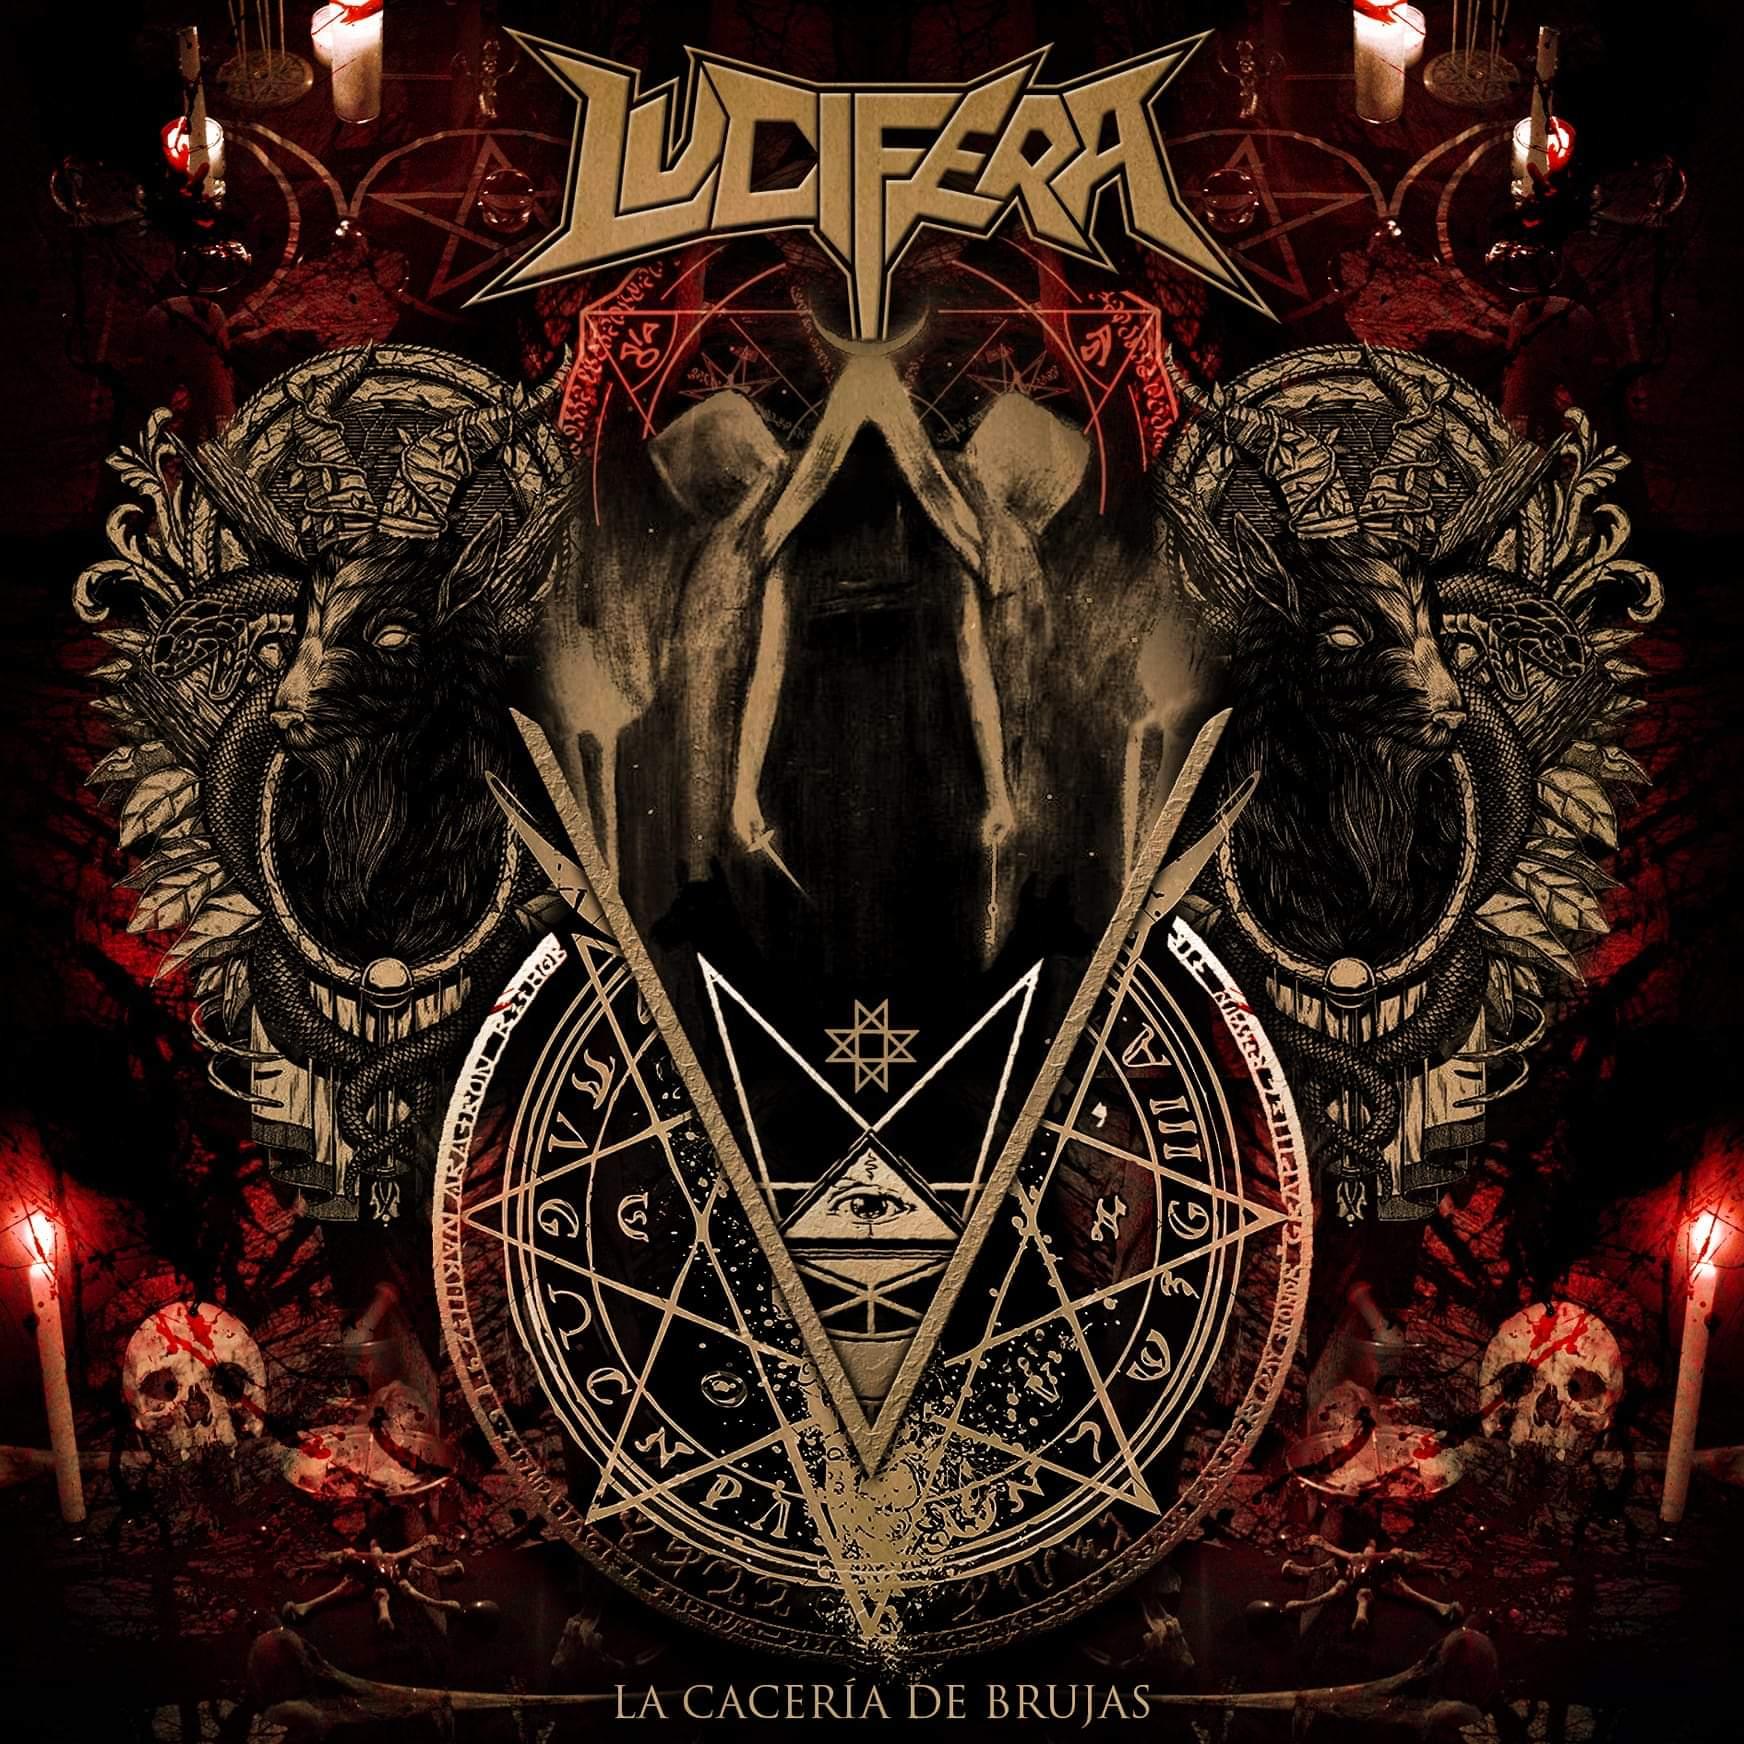 lucifera-la-caceria-de-brujas-ein-album-review